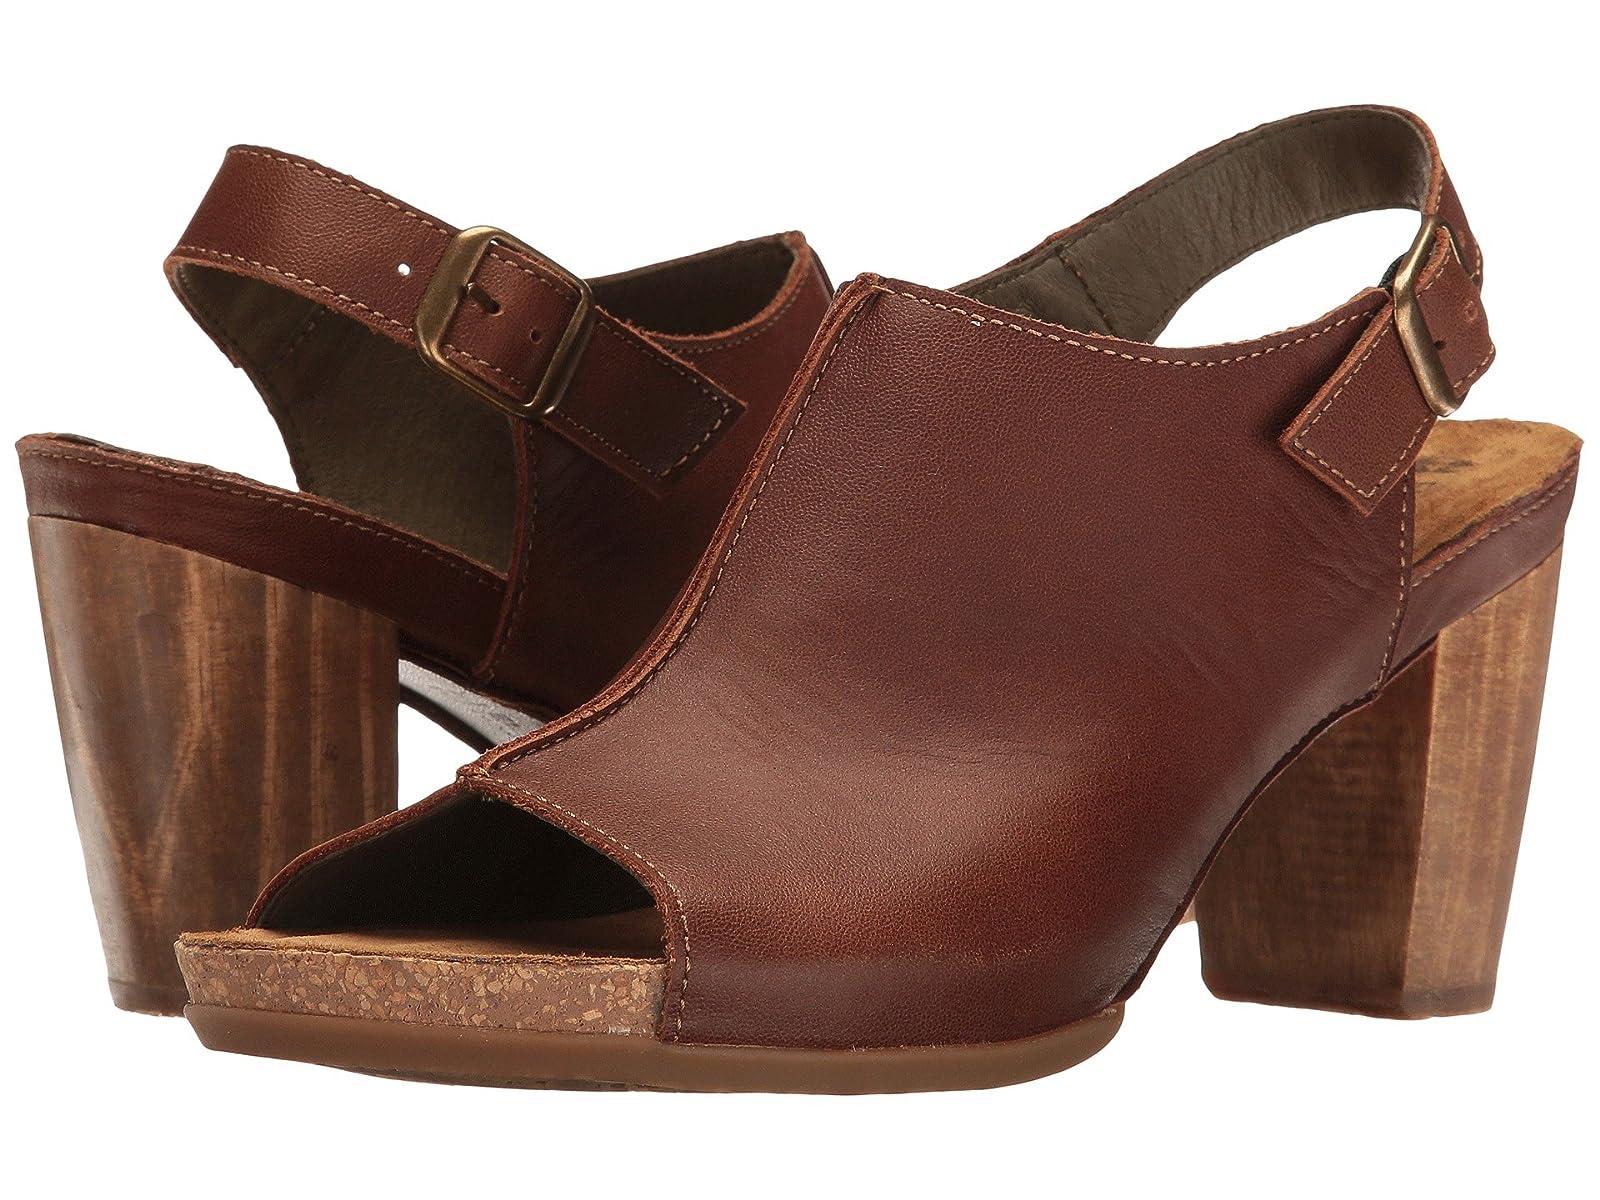 El Naturalista Kuna N5022Cheap and distinctive eye-catching shoes